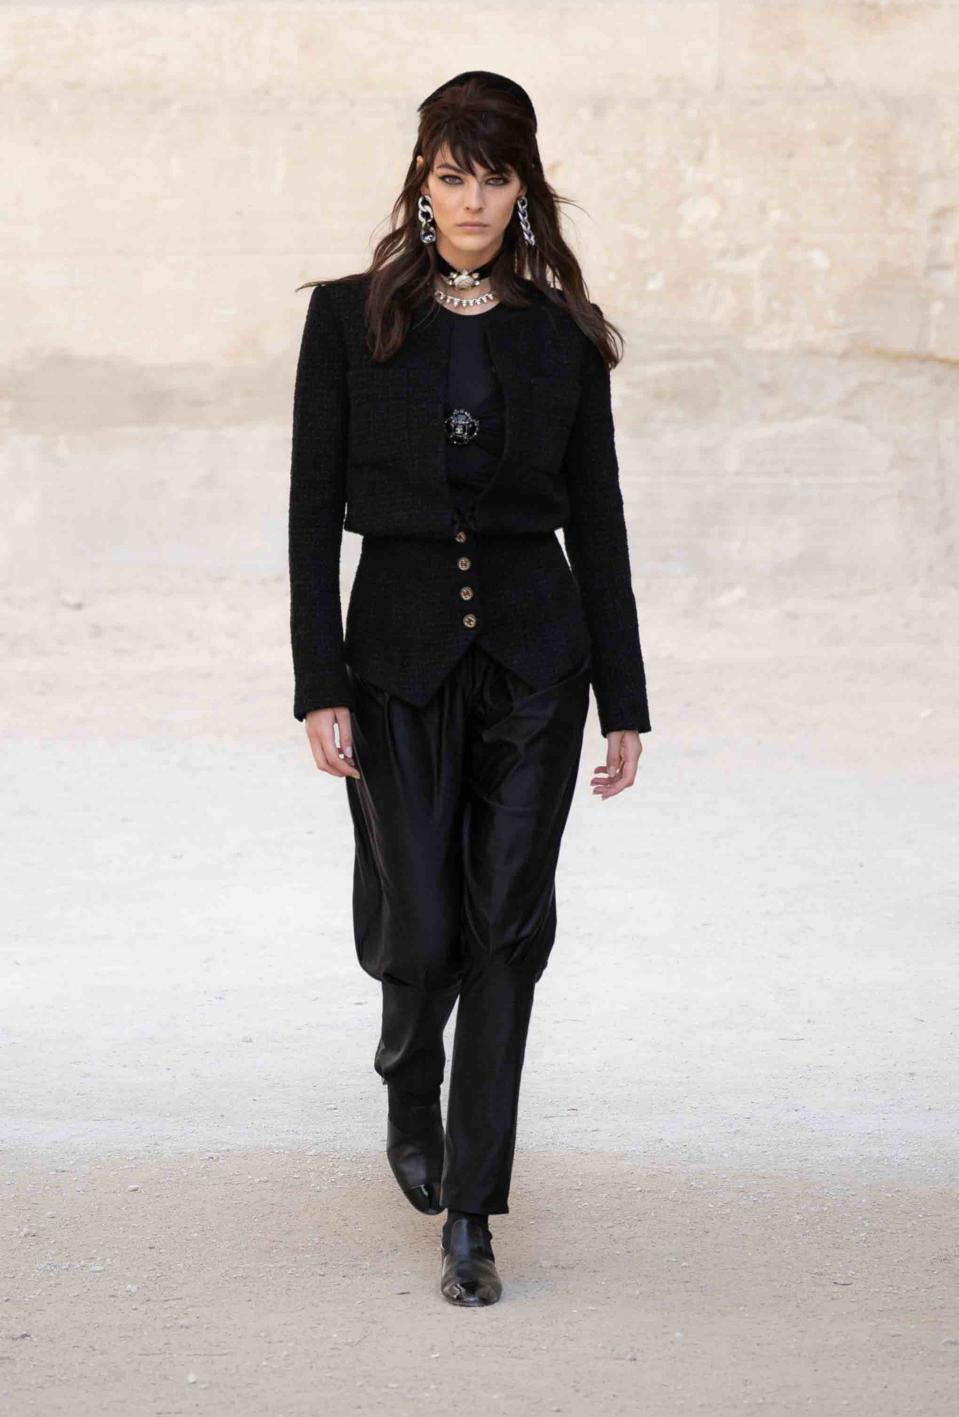 Vittoria Ceretti is wearing a new feminine interpretation of the tweed jacket worn with fluid jodhpurs and patent glove booties